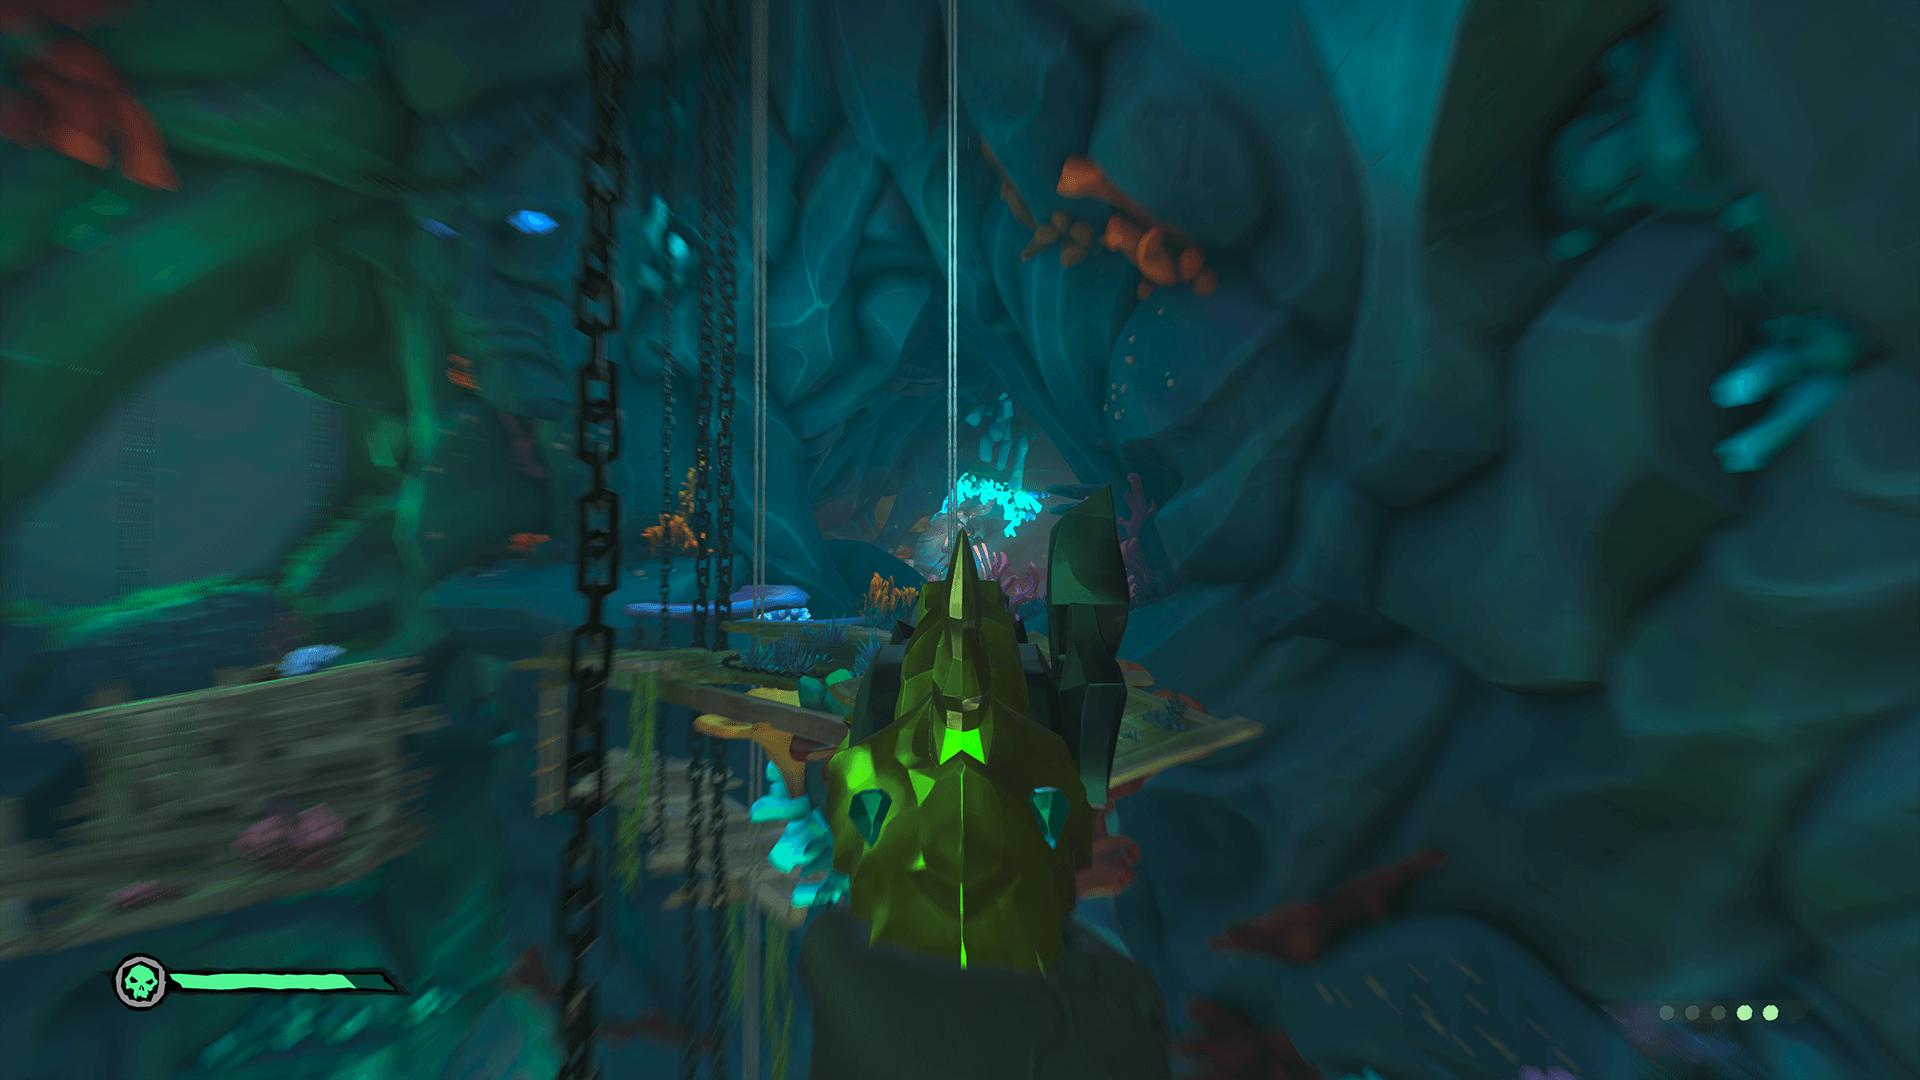 Citadel-Cavern3-Activating the Main Statue